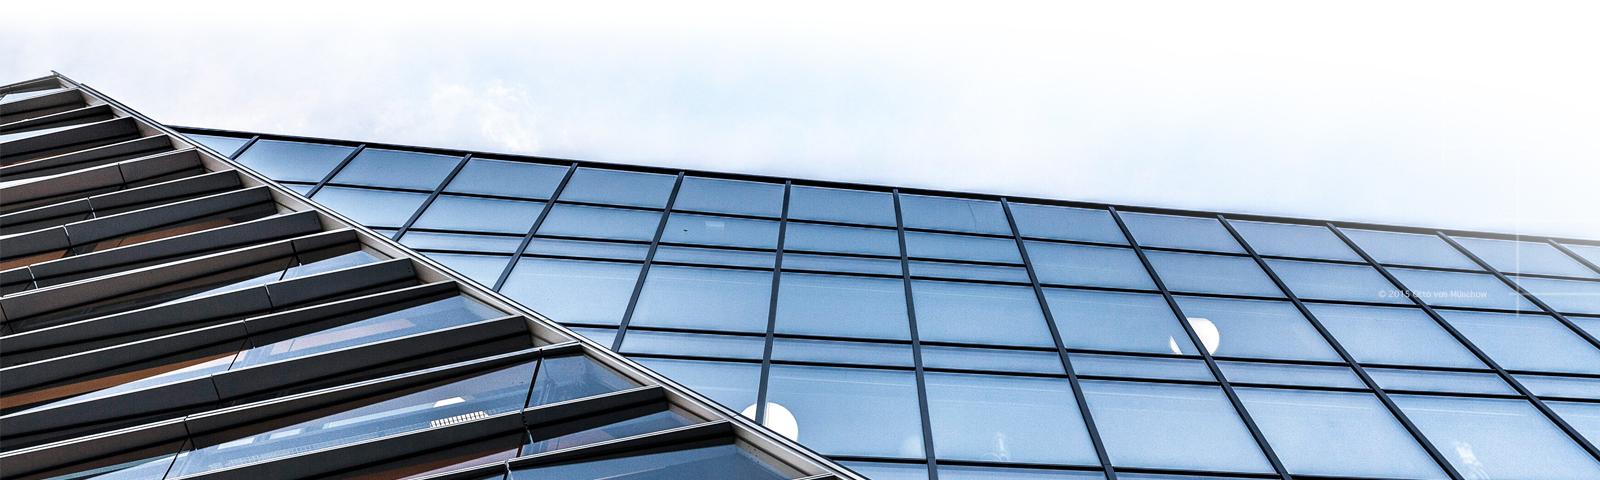 Curtainwall. Foto: ©Otto von Munchow